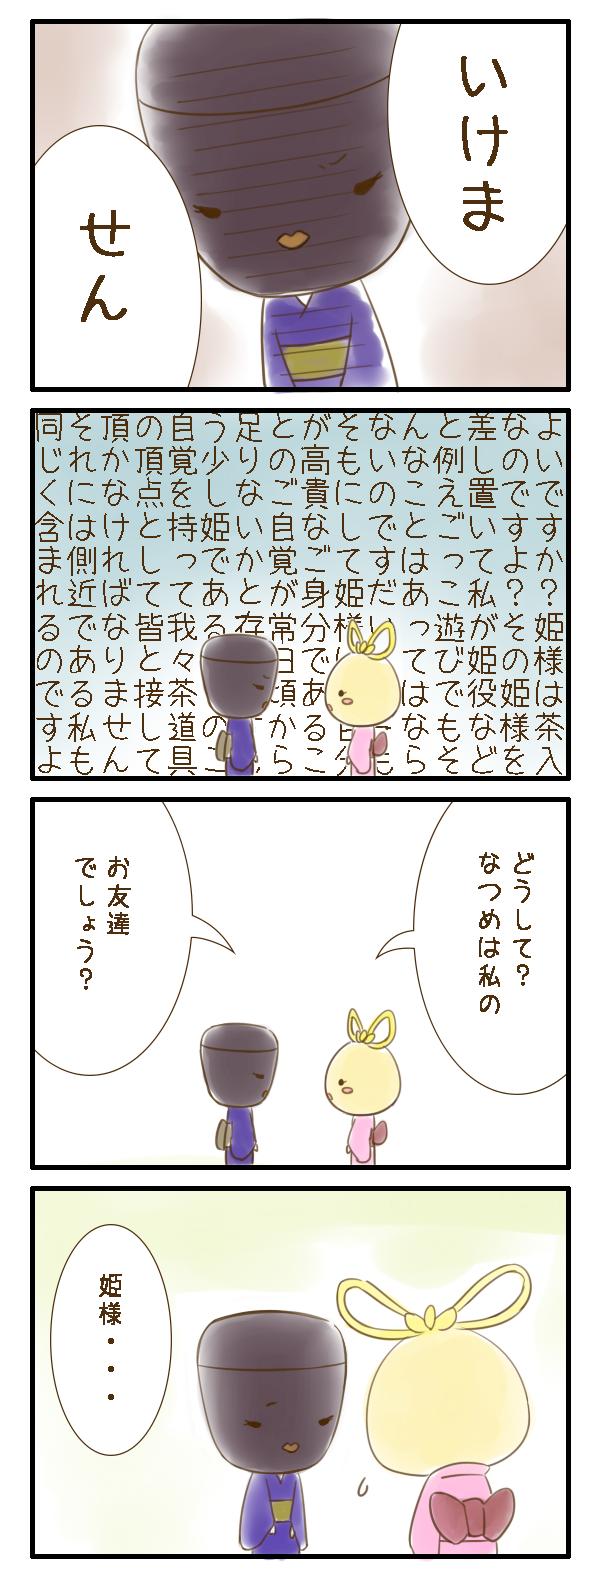 tomodachi02